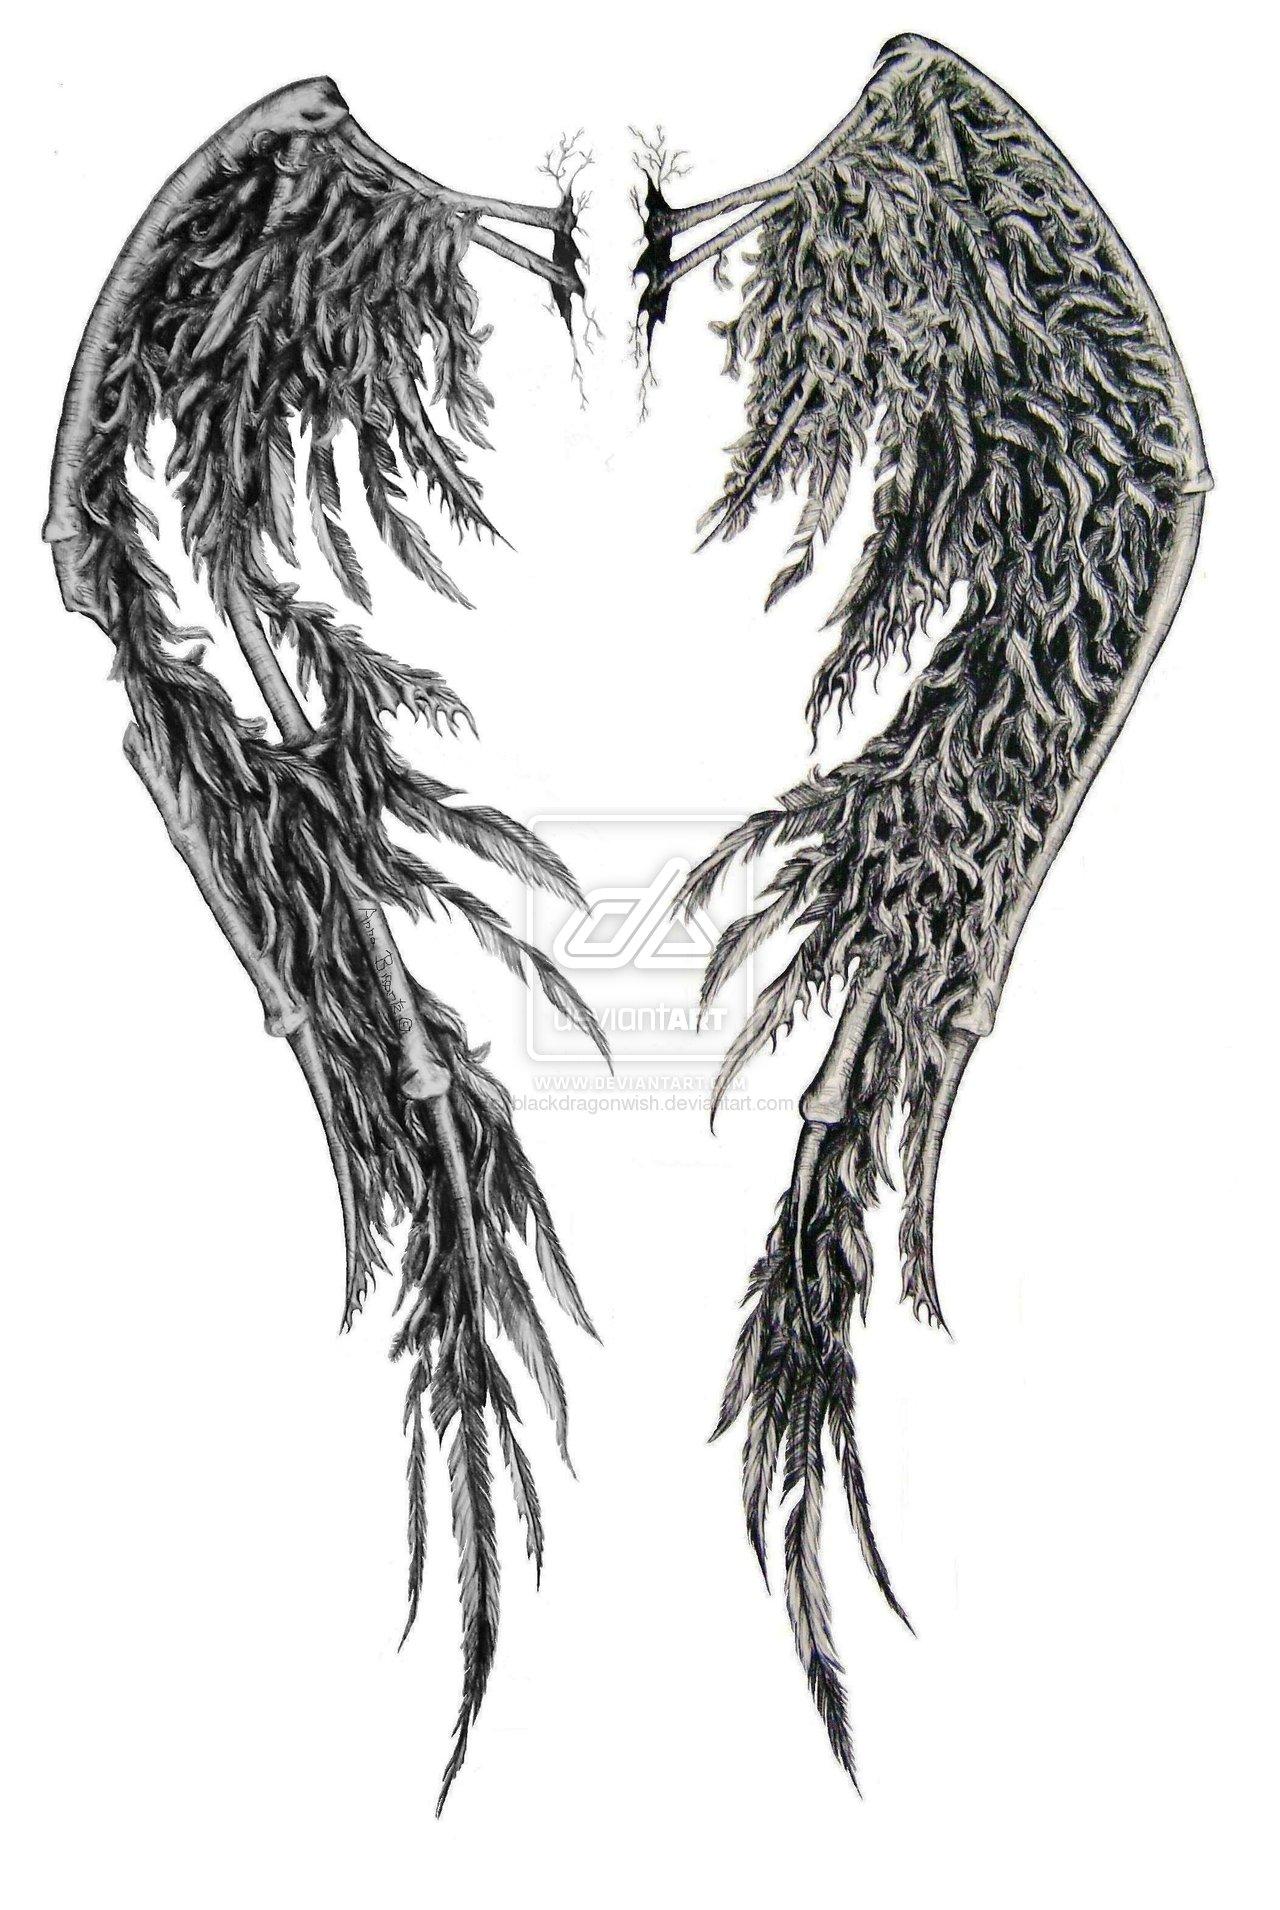 Skeleton Wings Tattoo